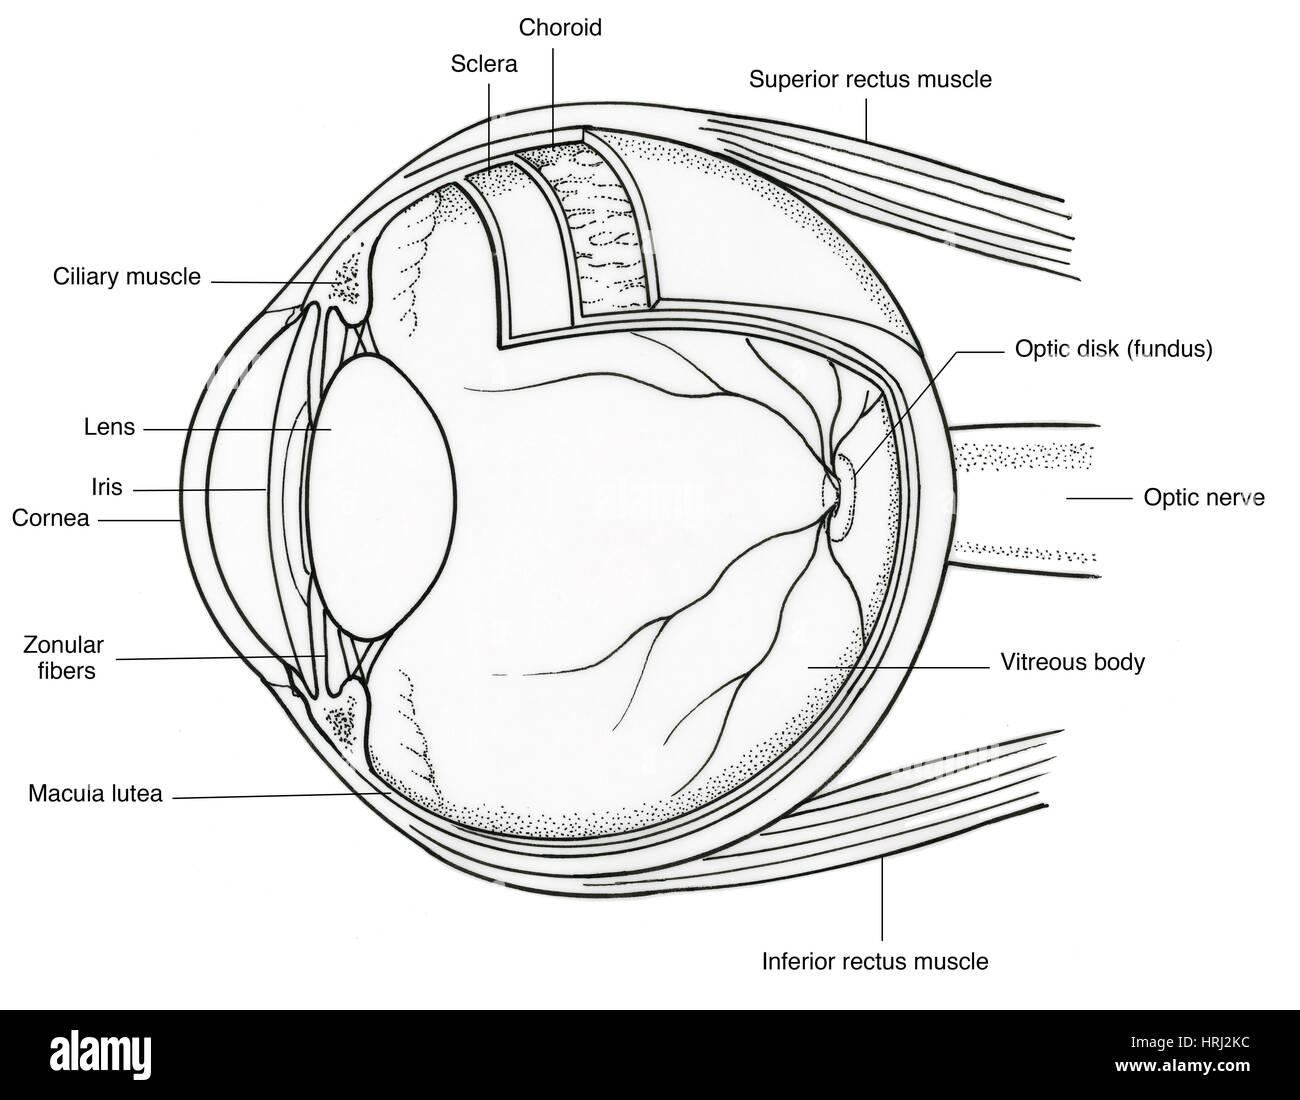 Illustration of Eye Anatomy Stock Photo: 135006912 - Alamy